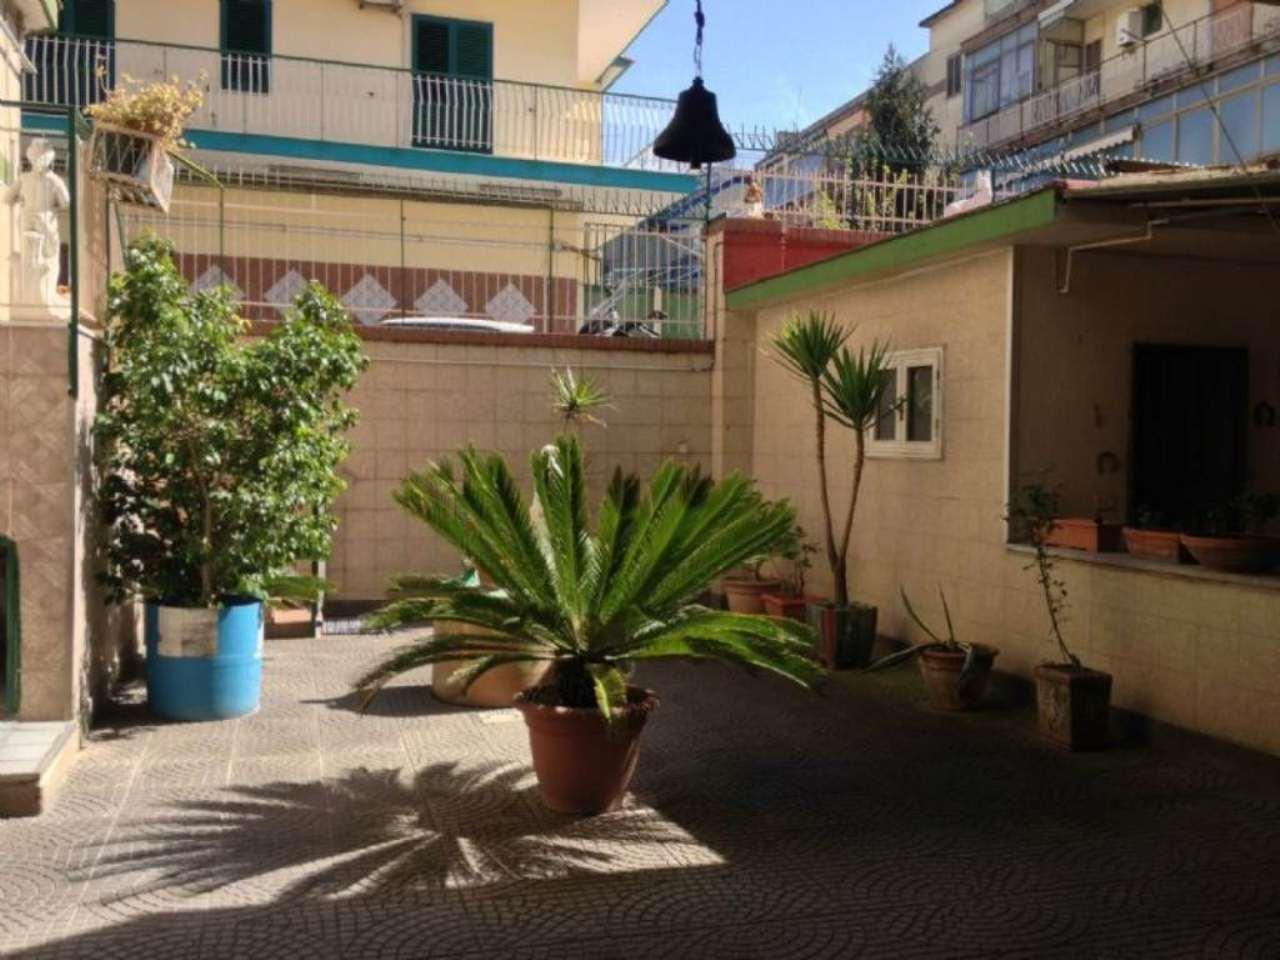 Casa indipendente in vendita 5 vani 135 mq.  via Giambattista Vela  170 Napoli